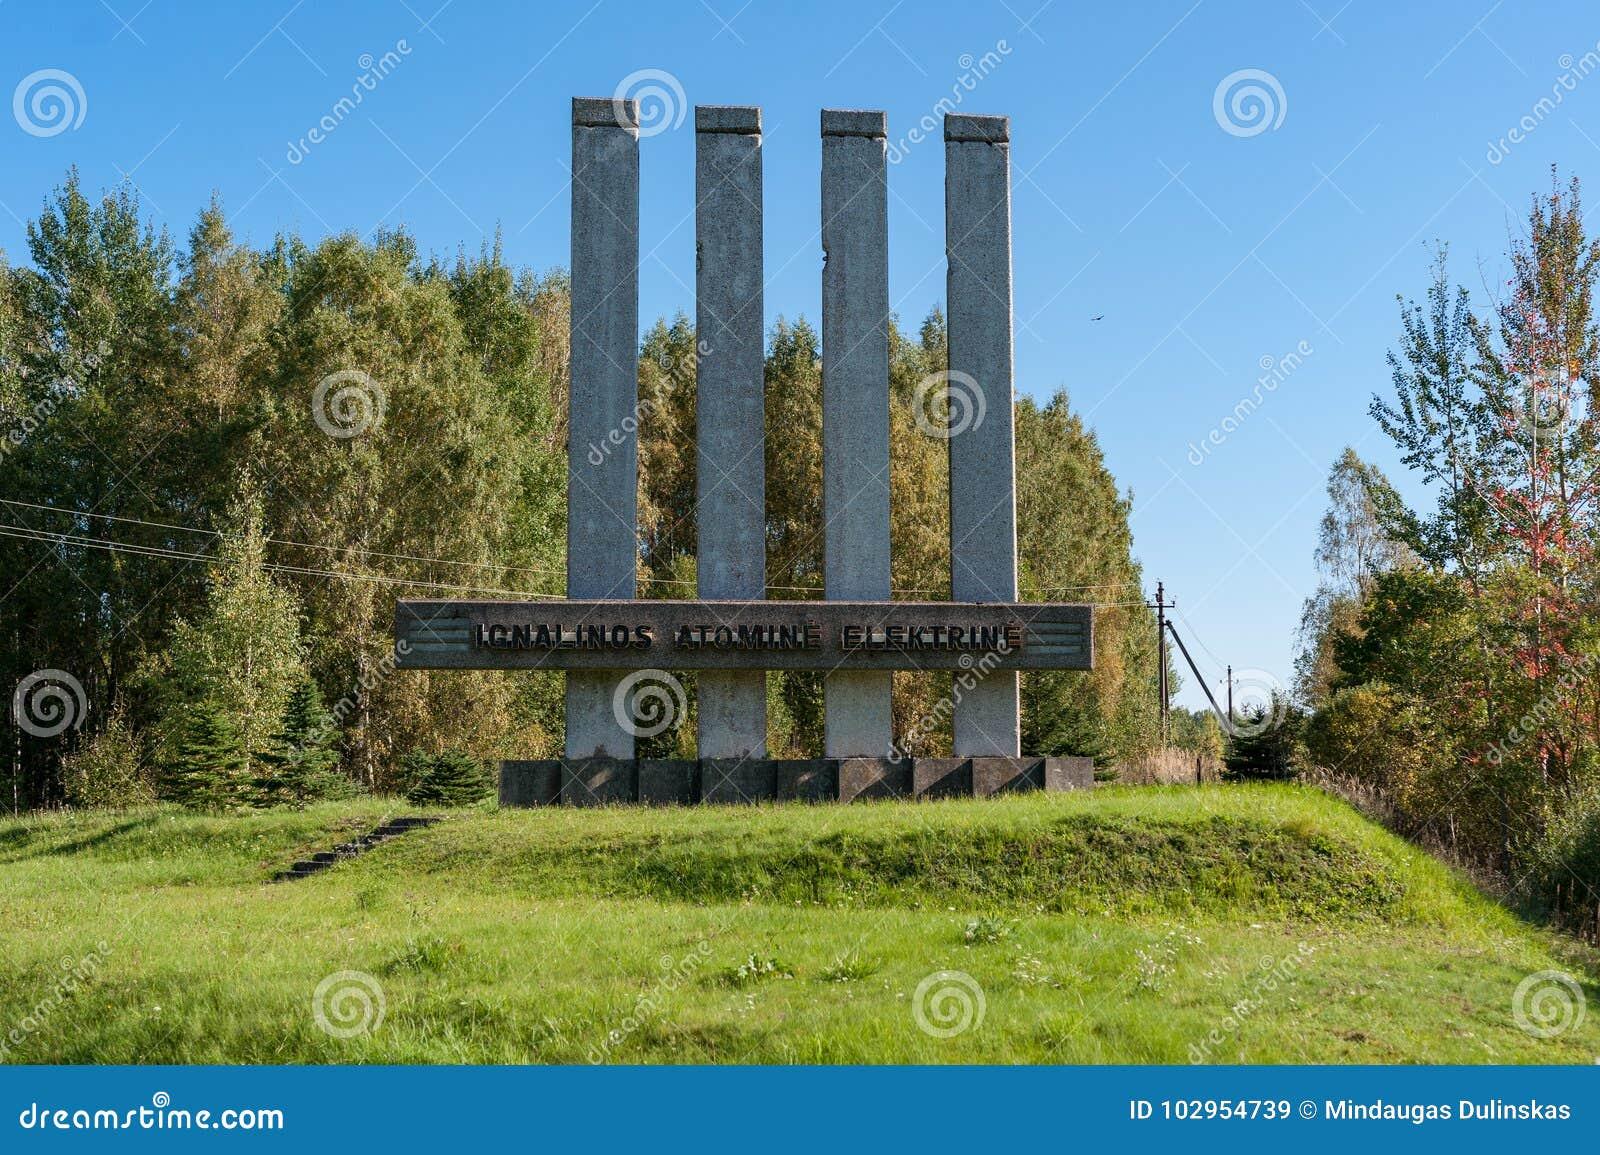 VISAGINAS, LITHUANIA - SEPTEMBER 24, 2017: Visaginas Nuclear Plant Power Name in Lithuania,